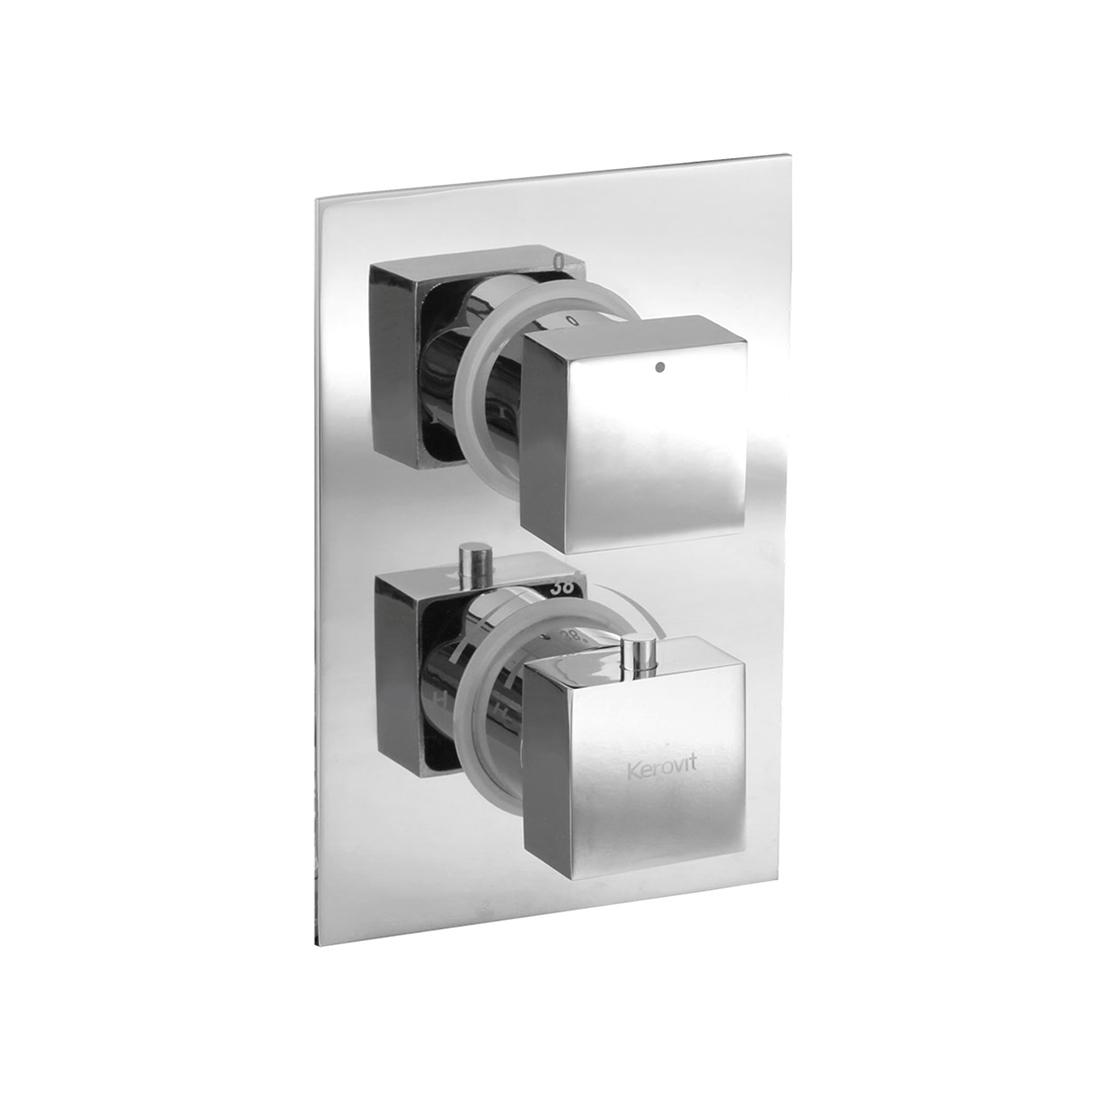 Kerovit KBTHS002 Concealed Hi-Flow Thermostatic Bath and Shower Mixer